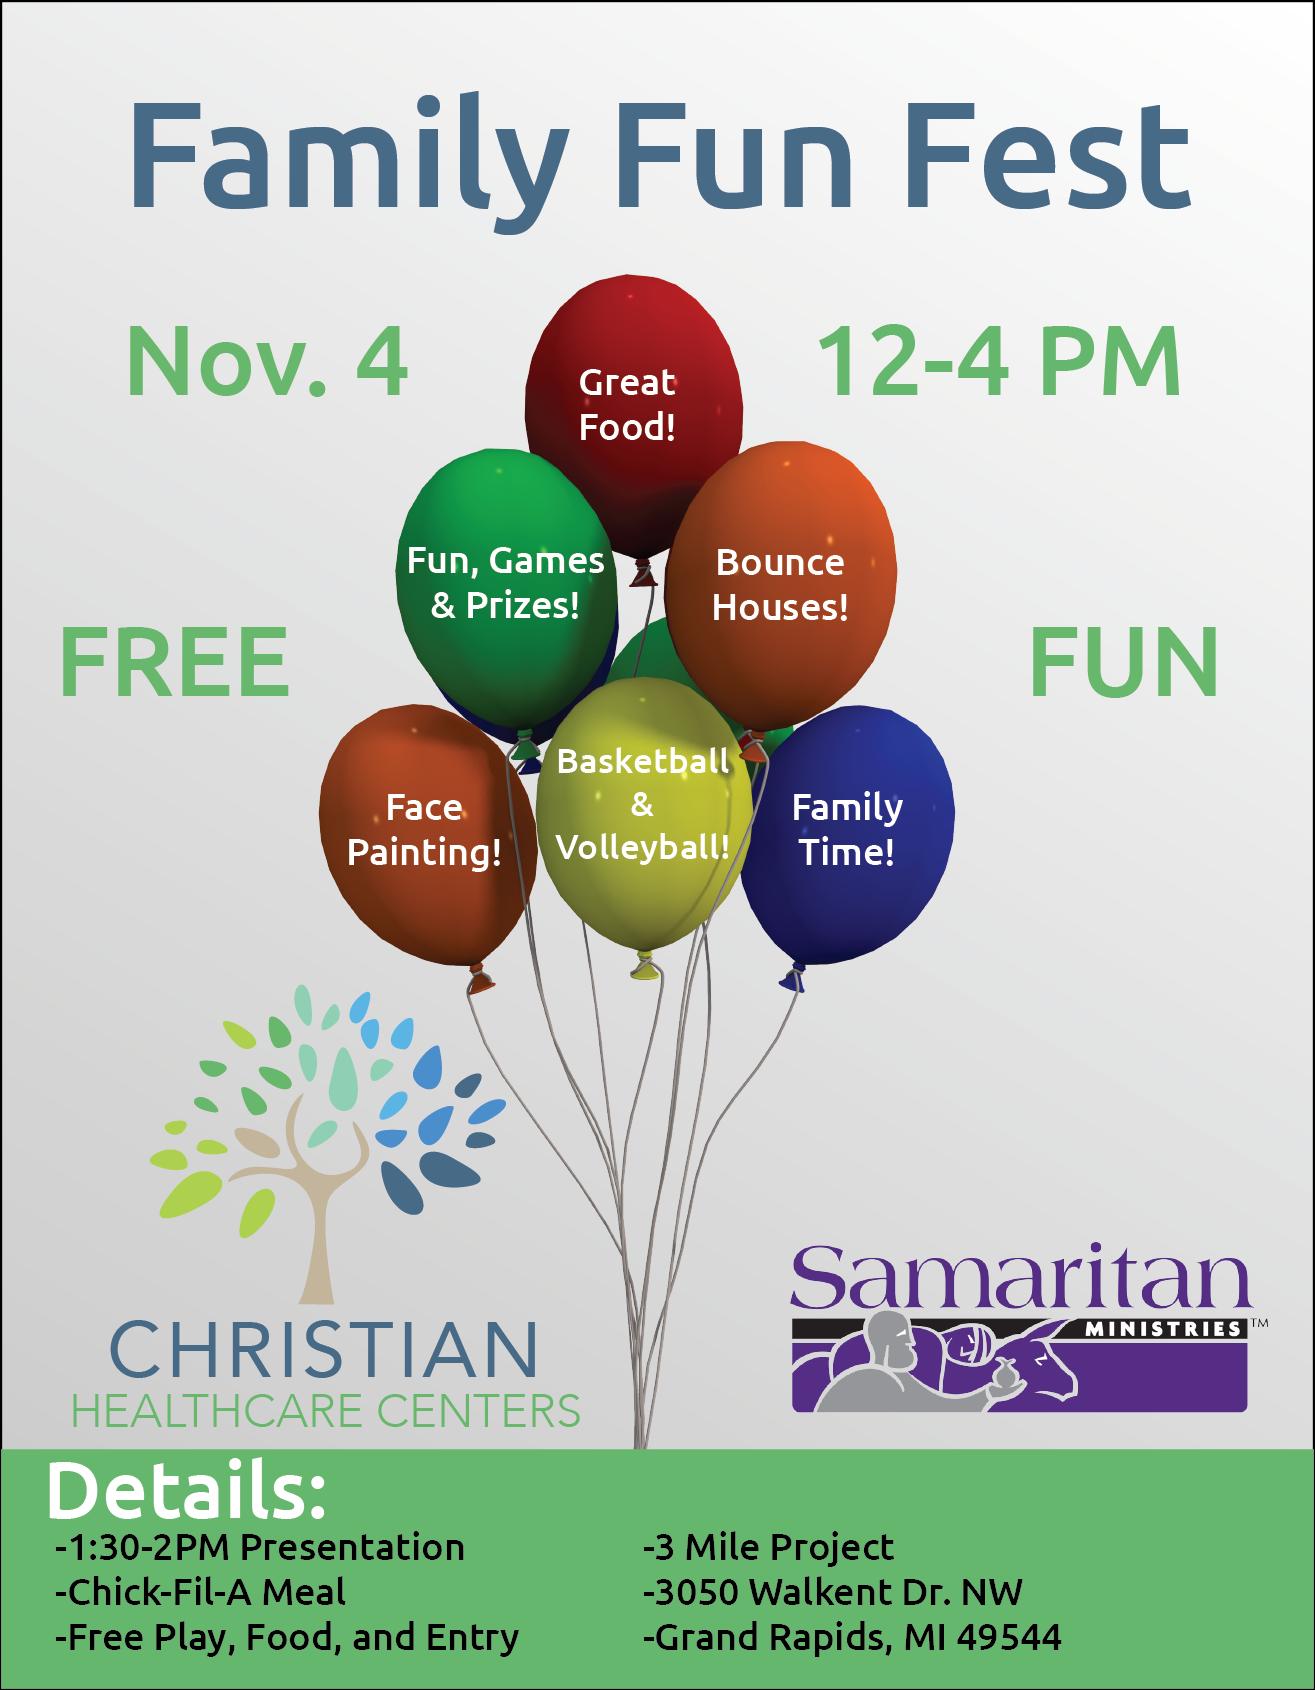 Family Fun Fest Poster - Christian Healthcare Centers